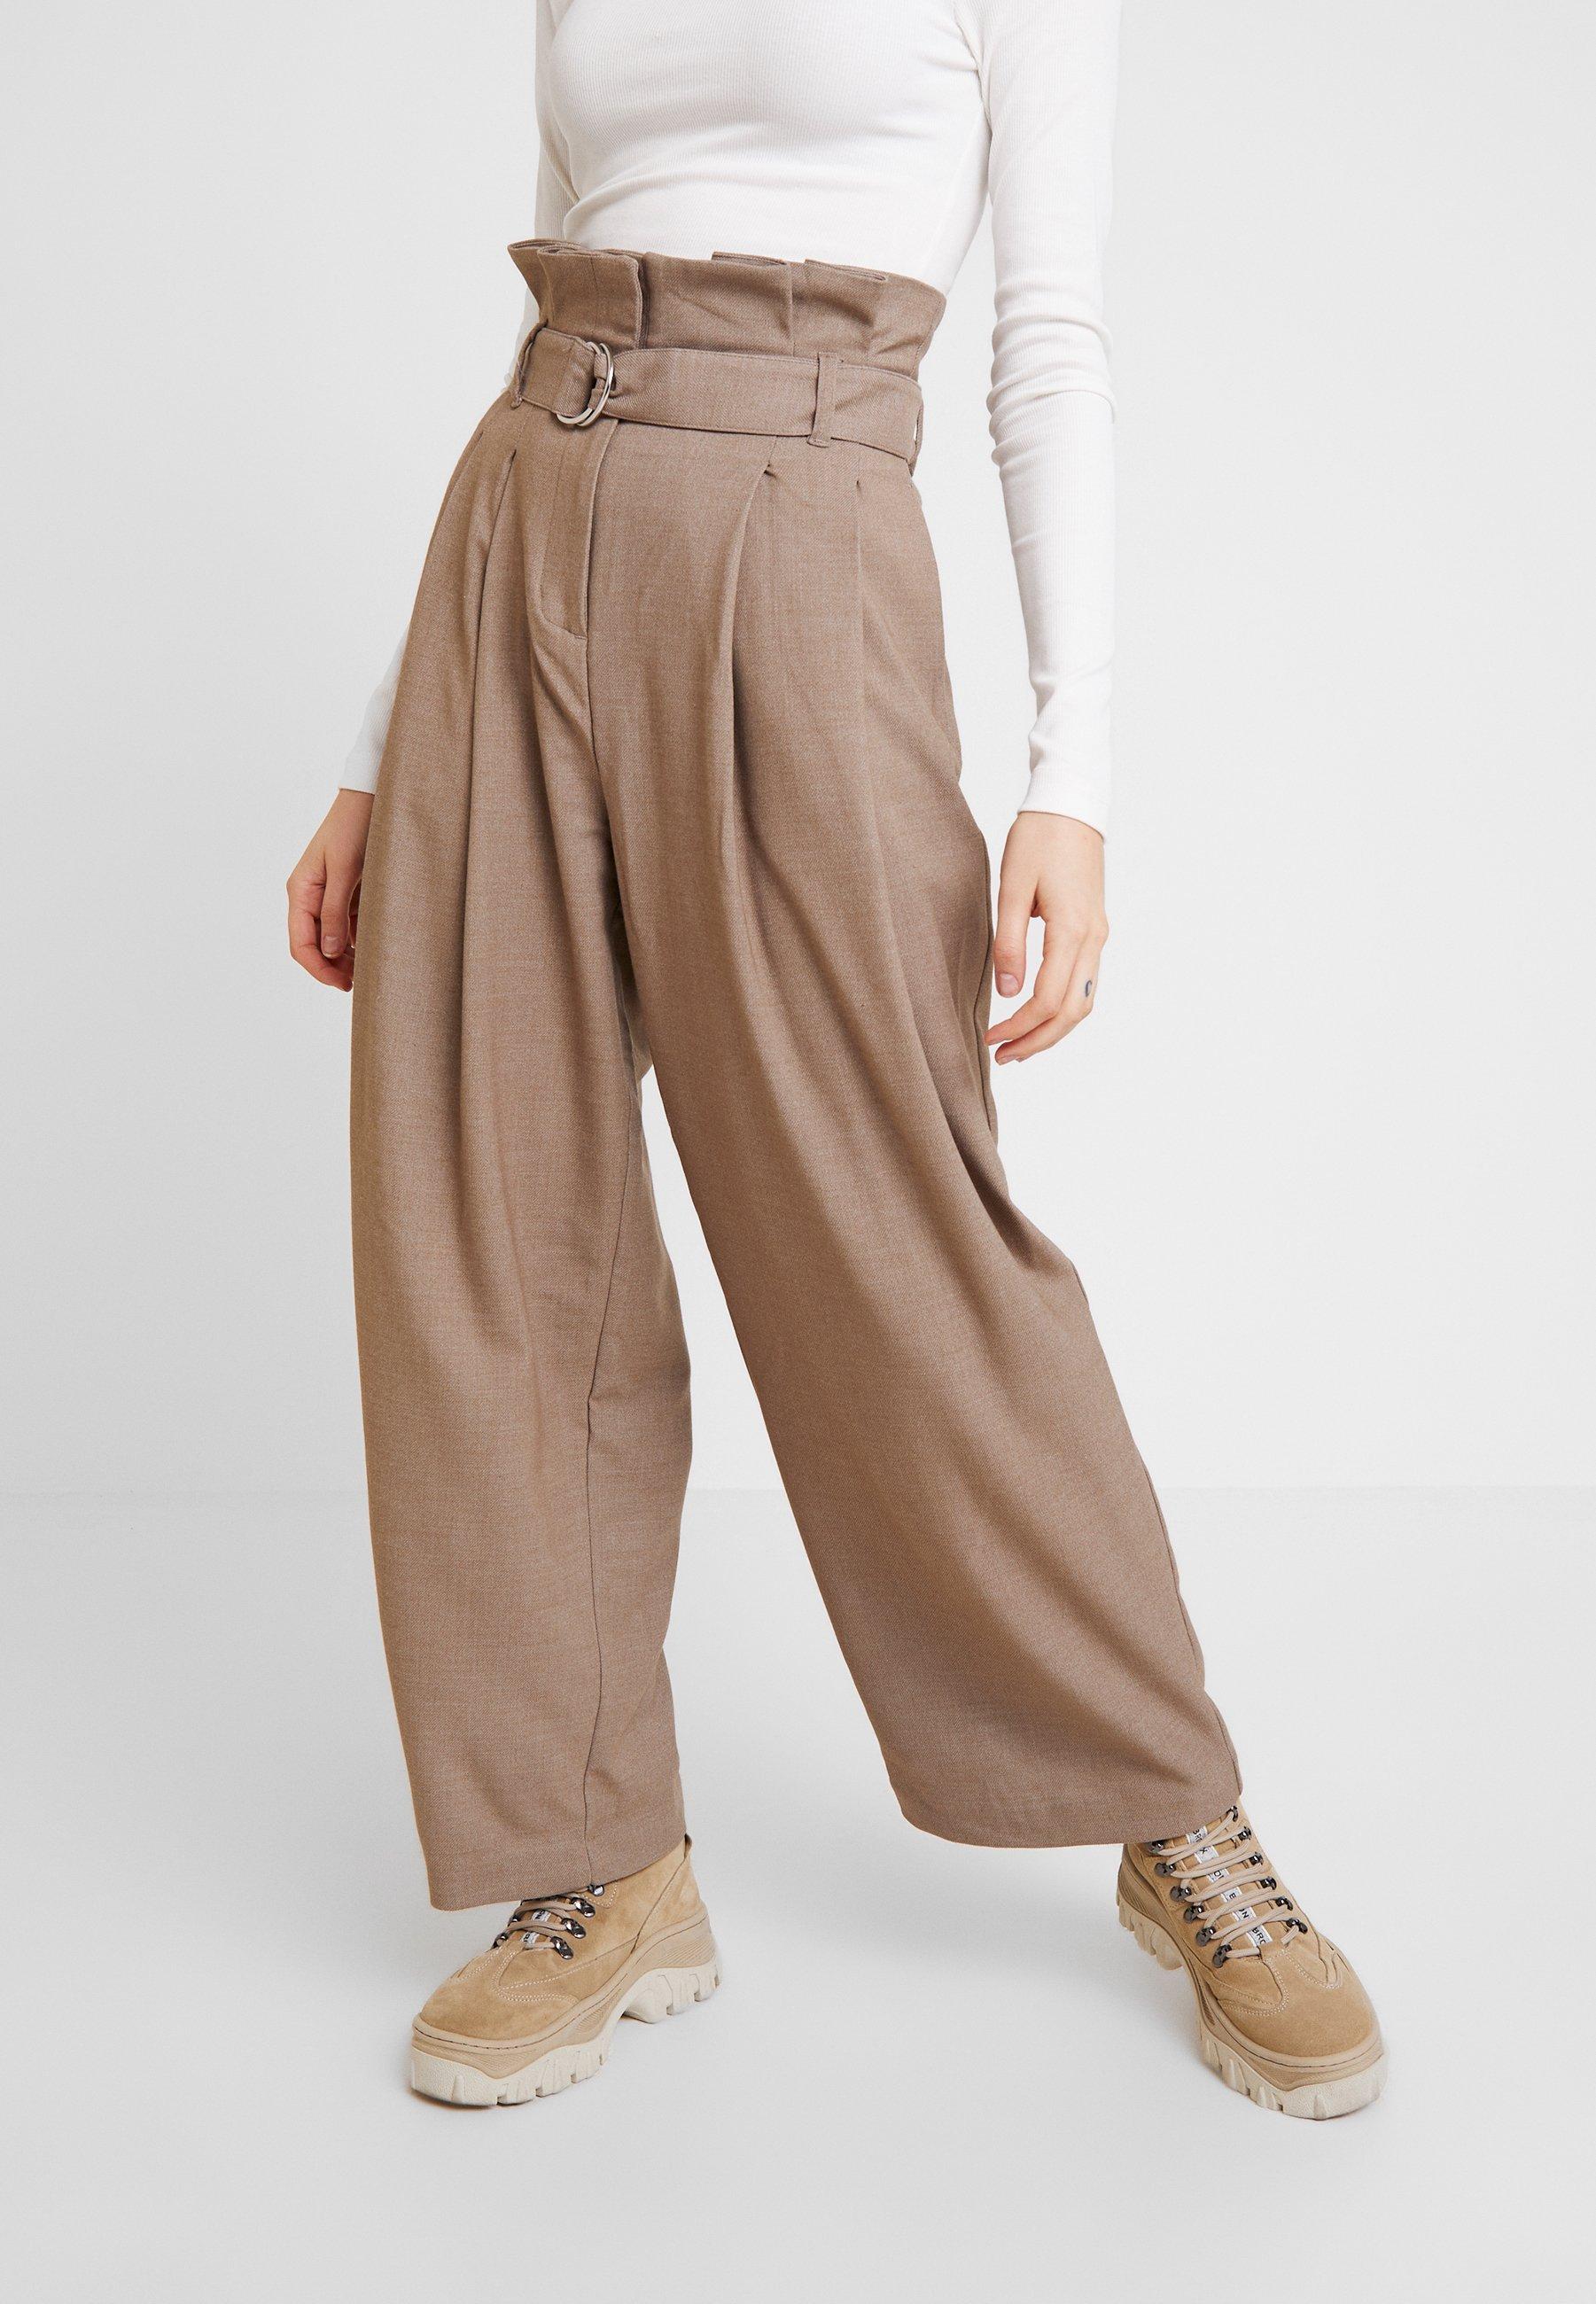 TrouserPantalon Paperbag Weekday Classique Mole Dark Peyton lF1c5K3TuJ